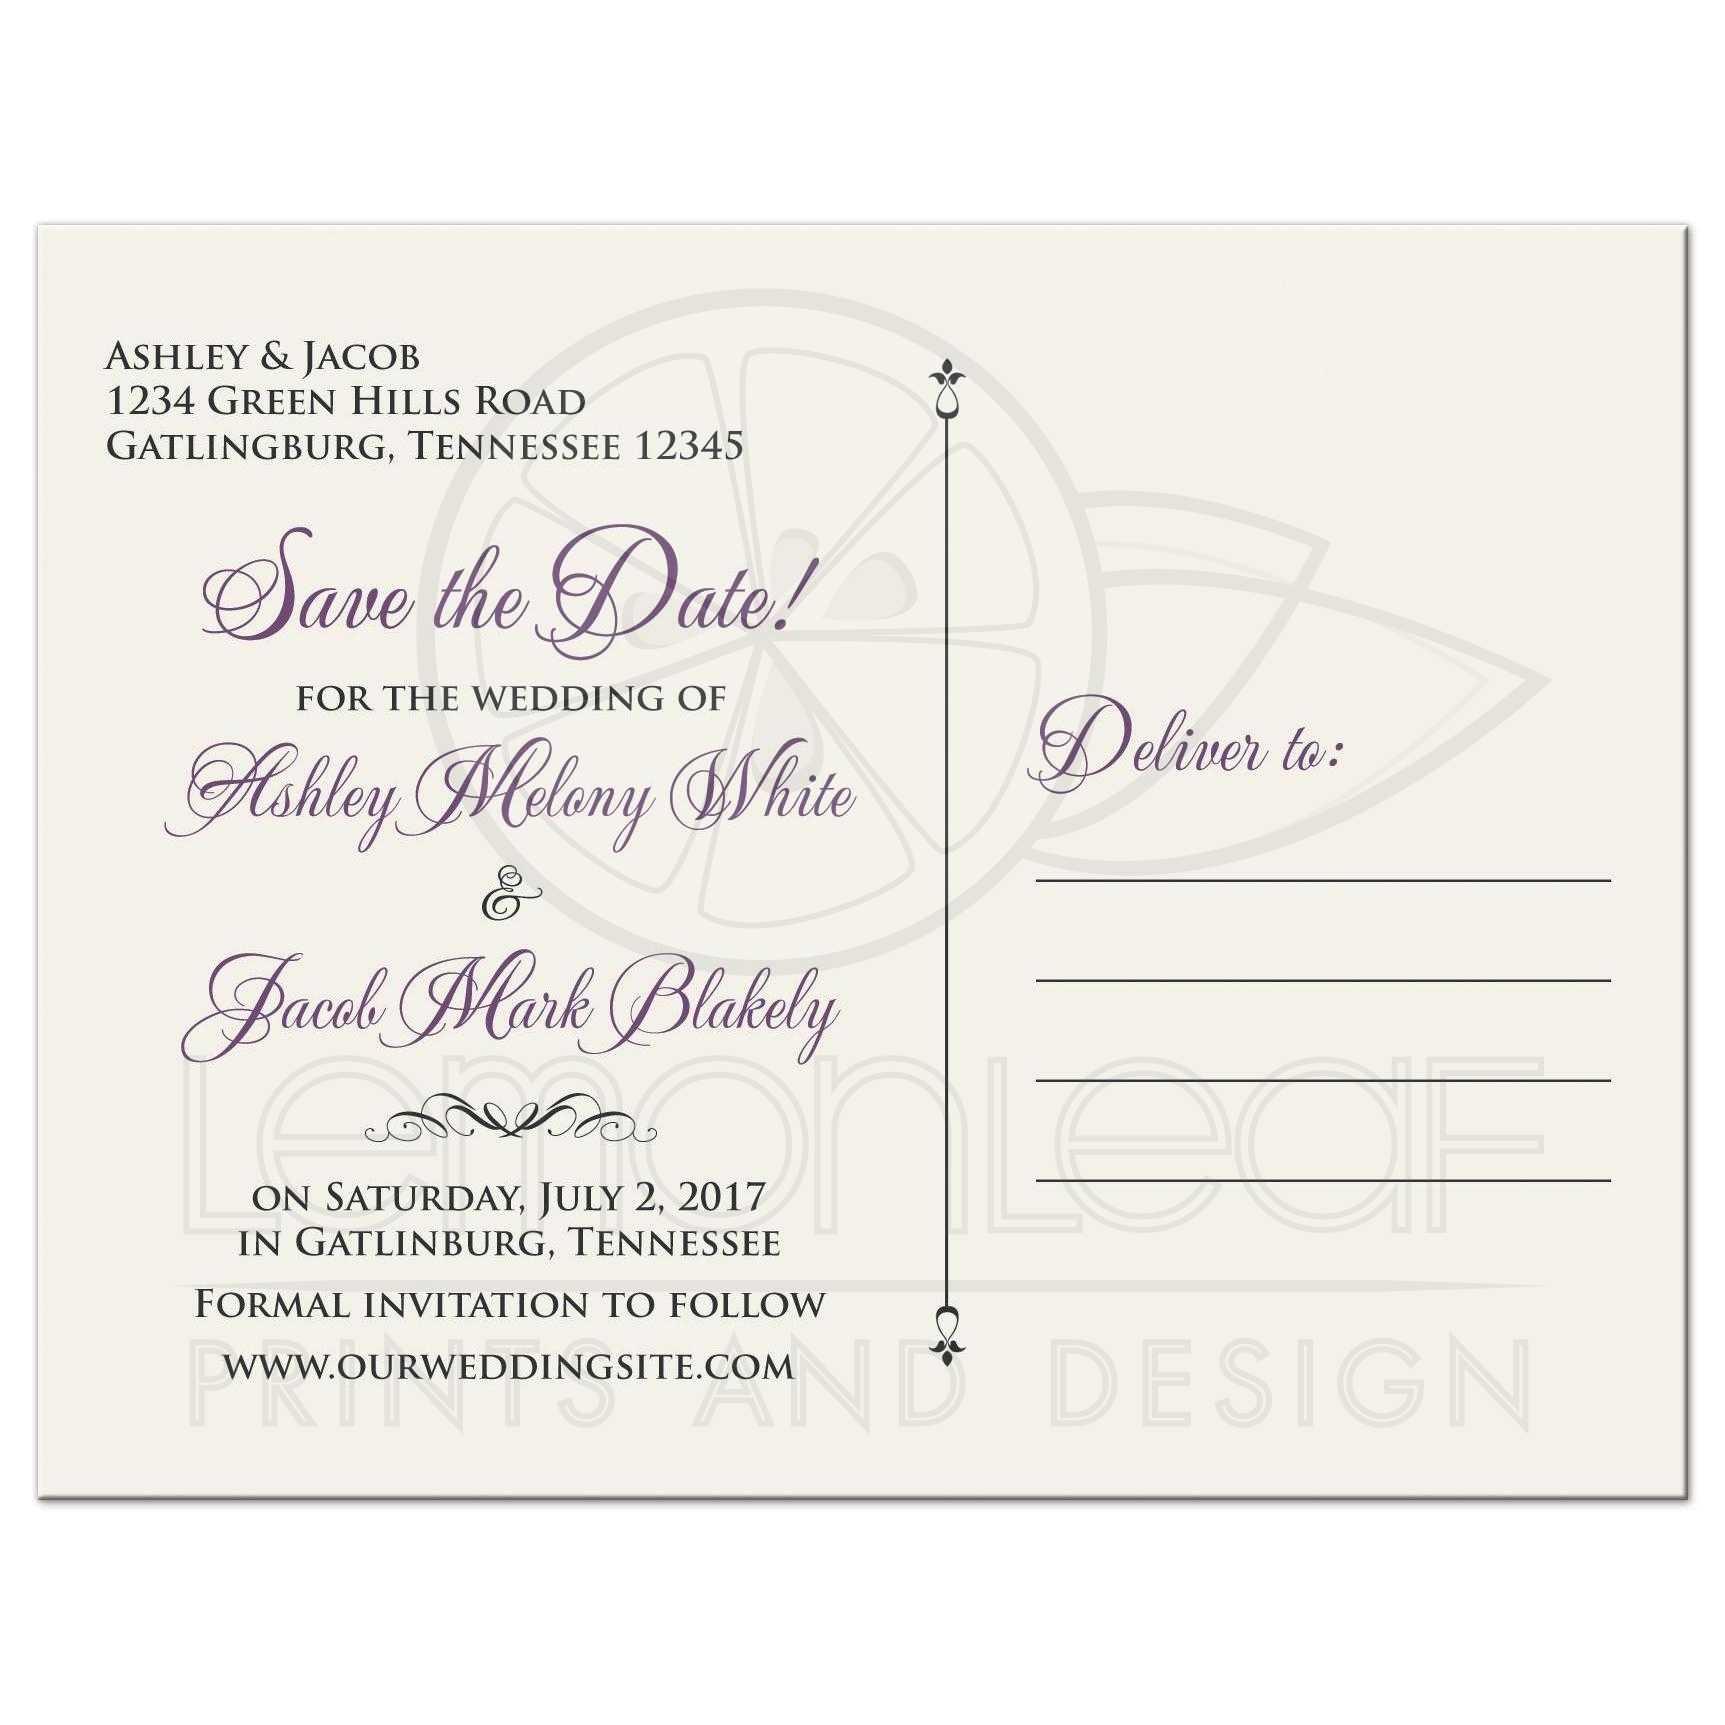 d66e332133e49 ... Vintage mauve purple grey ivory rose wedding save the date postcard back